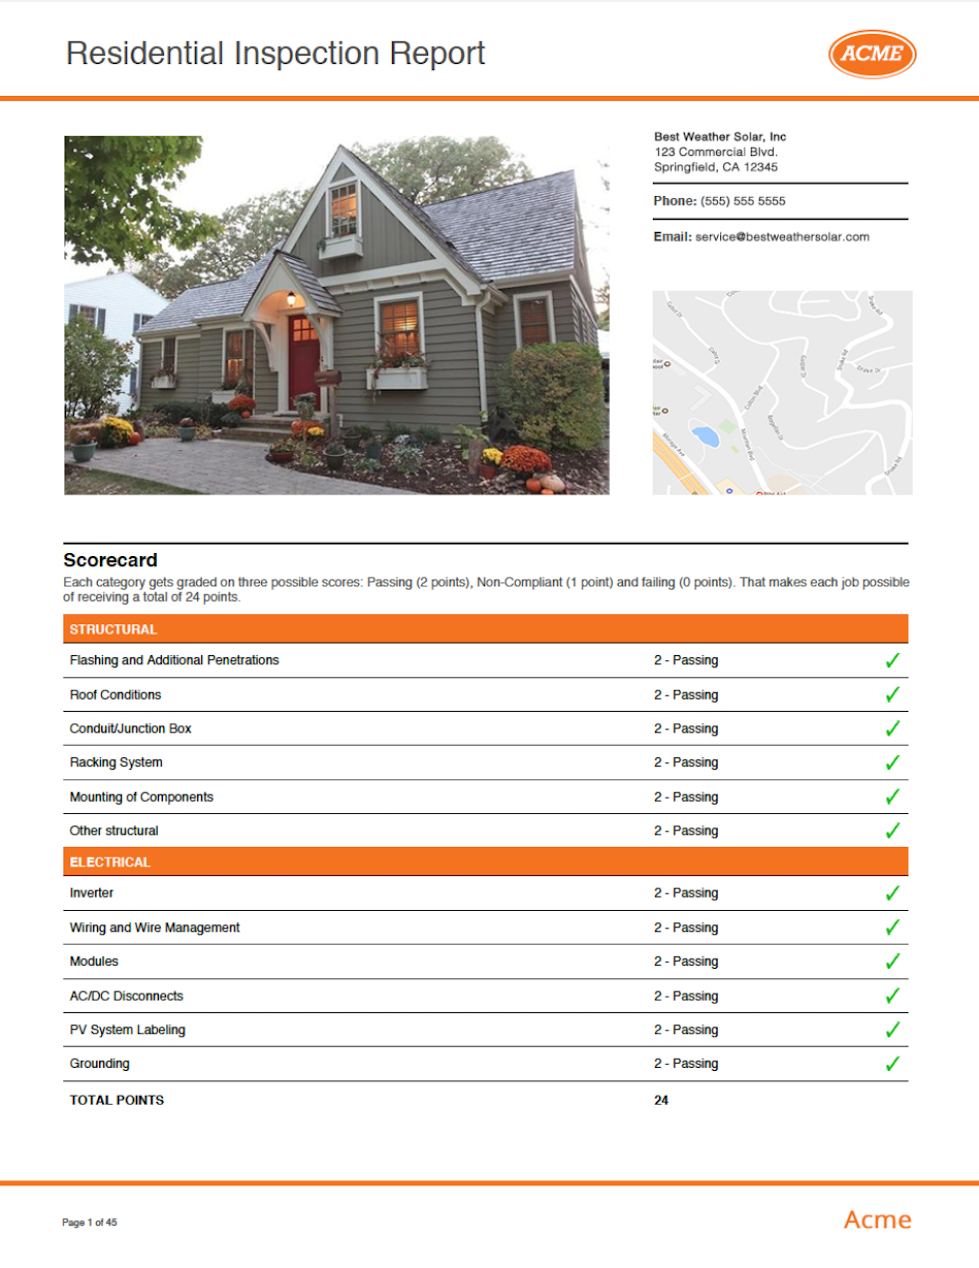 FotoNotes Software - Professional PDF Reports